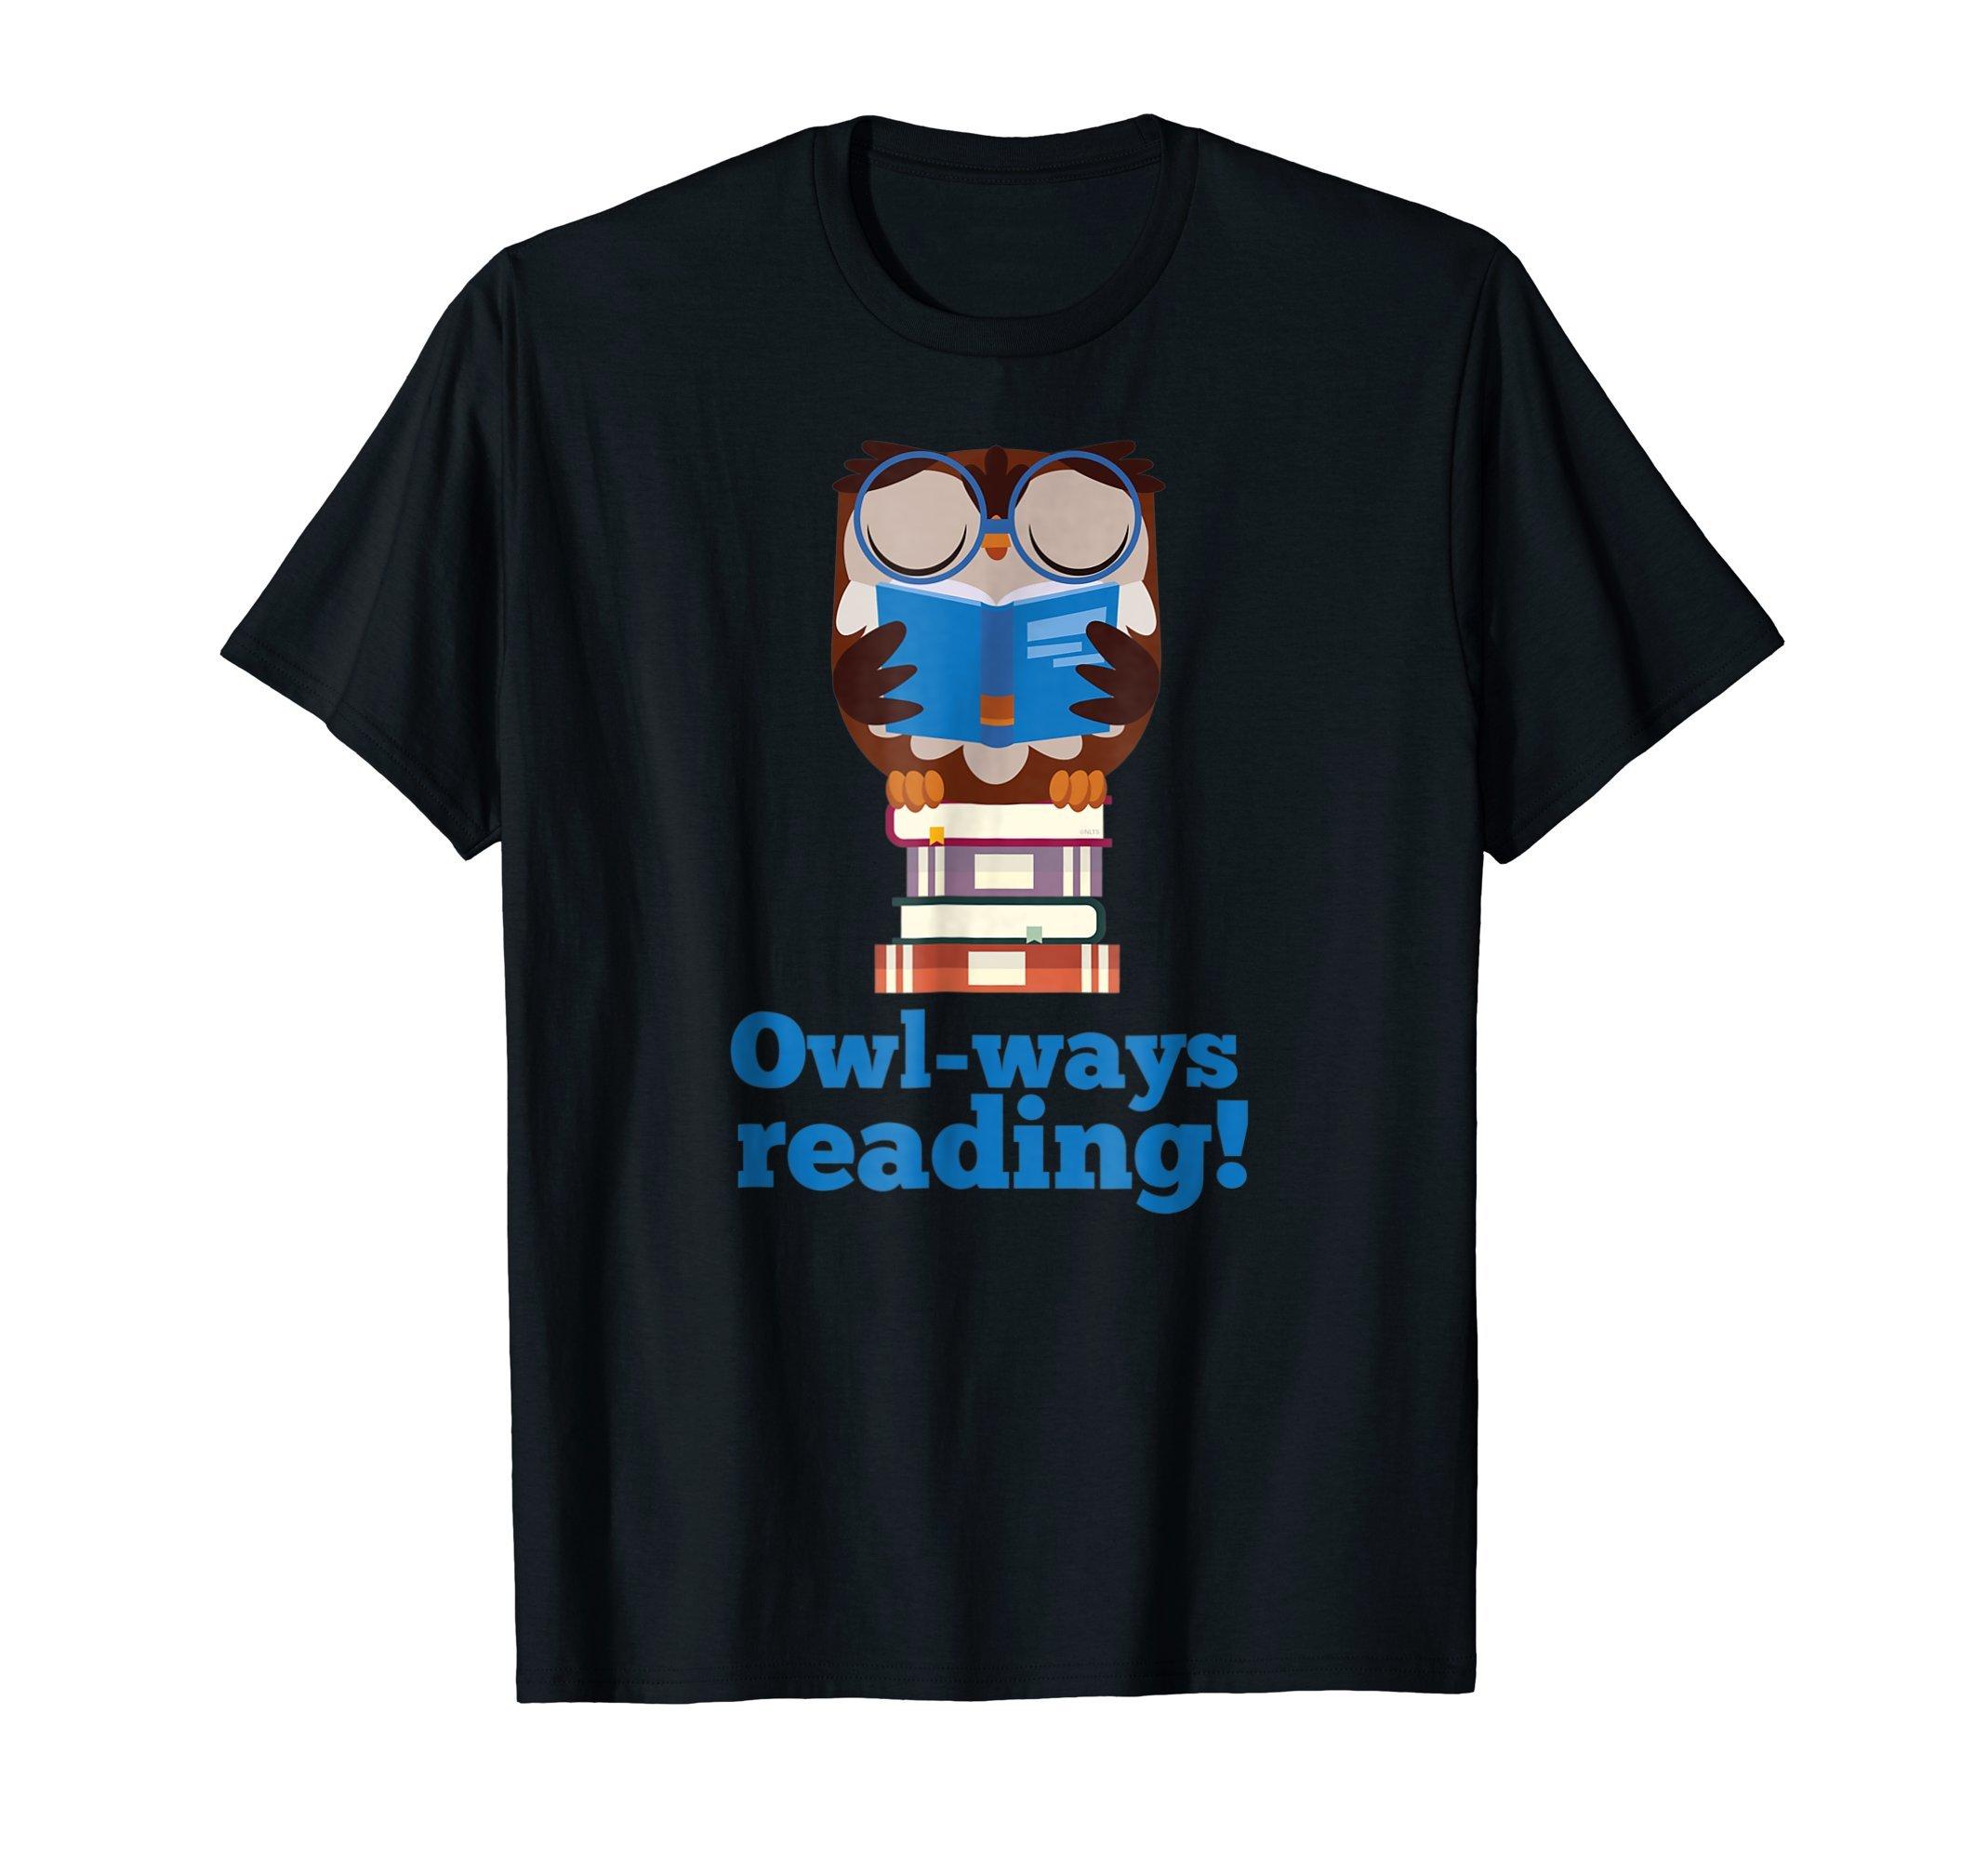 Owl-ways-reading-Owl-Funny-Humor-Cute-T-Shirt-Tee-Shirt